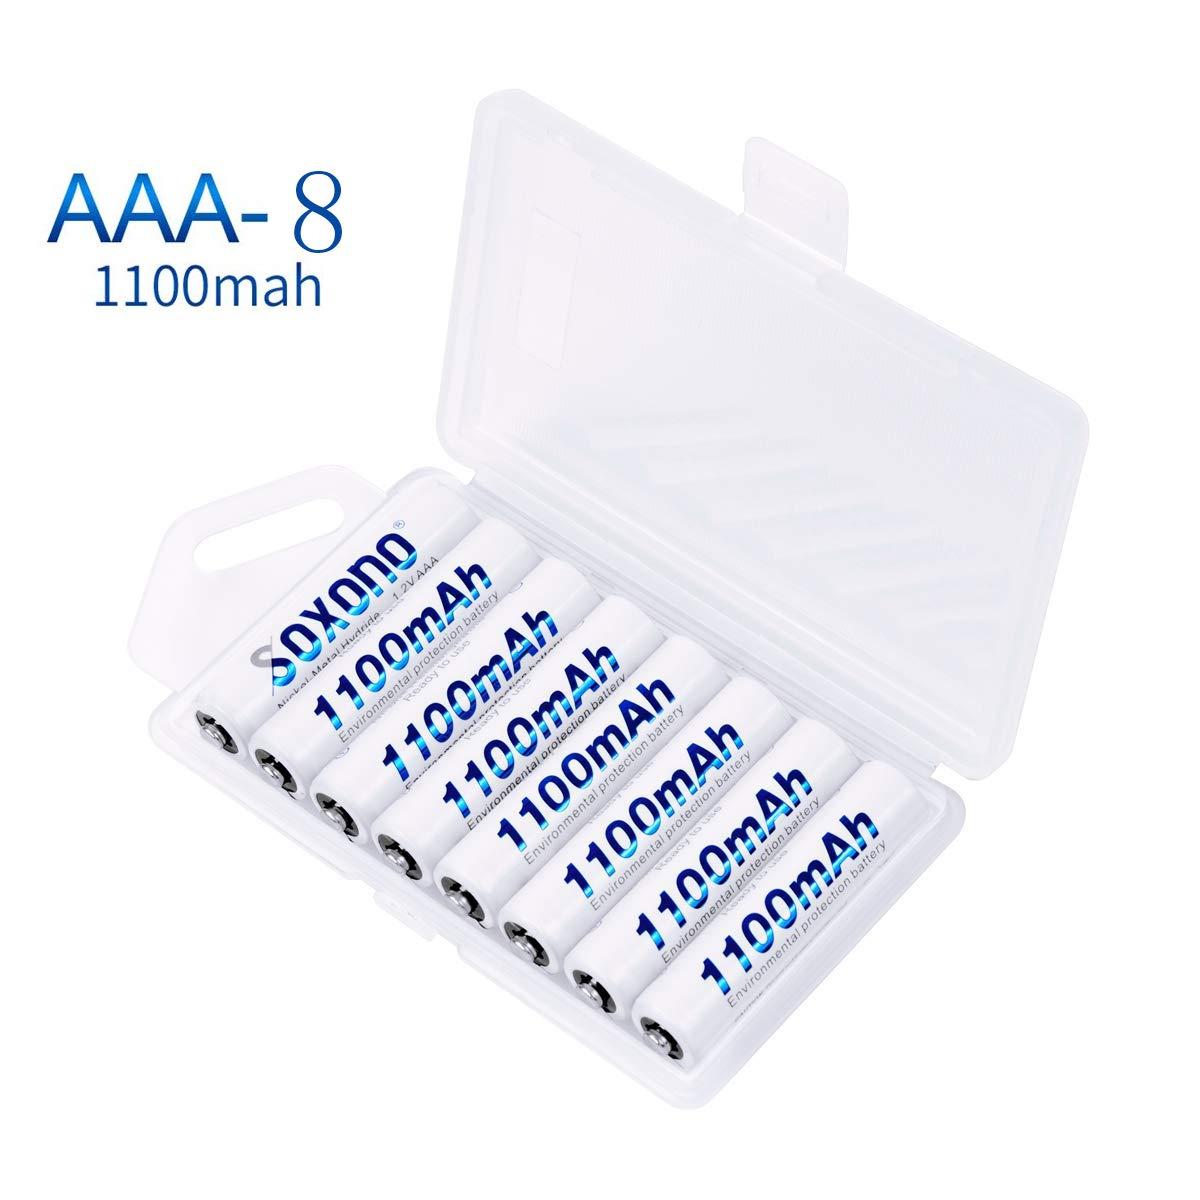 Soxono 8 Pack 1100mAh AAA Rechargeable Batteries 1.2V Ni-MH High-Capacity Triple A Batteries